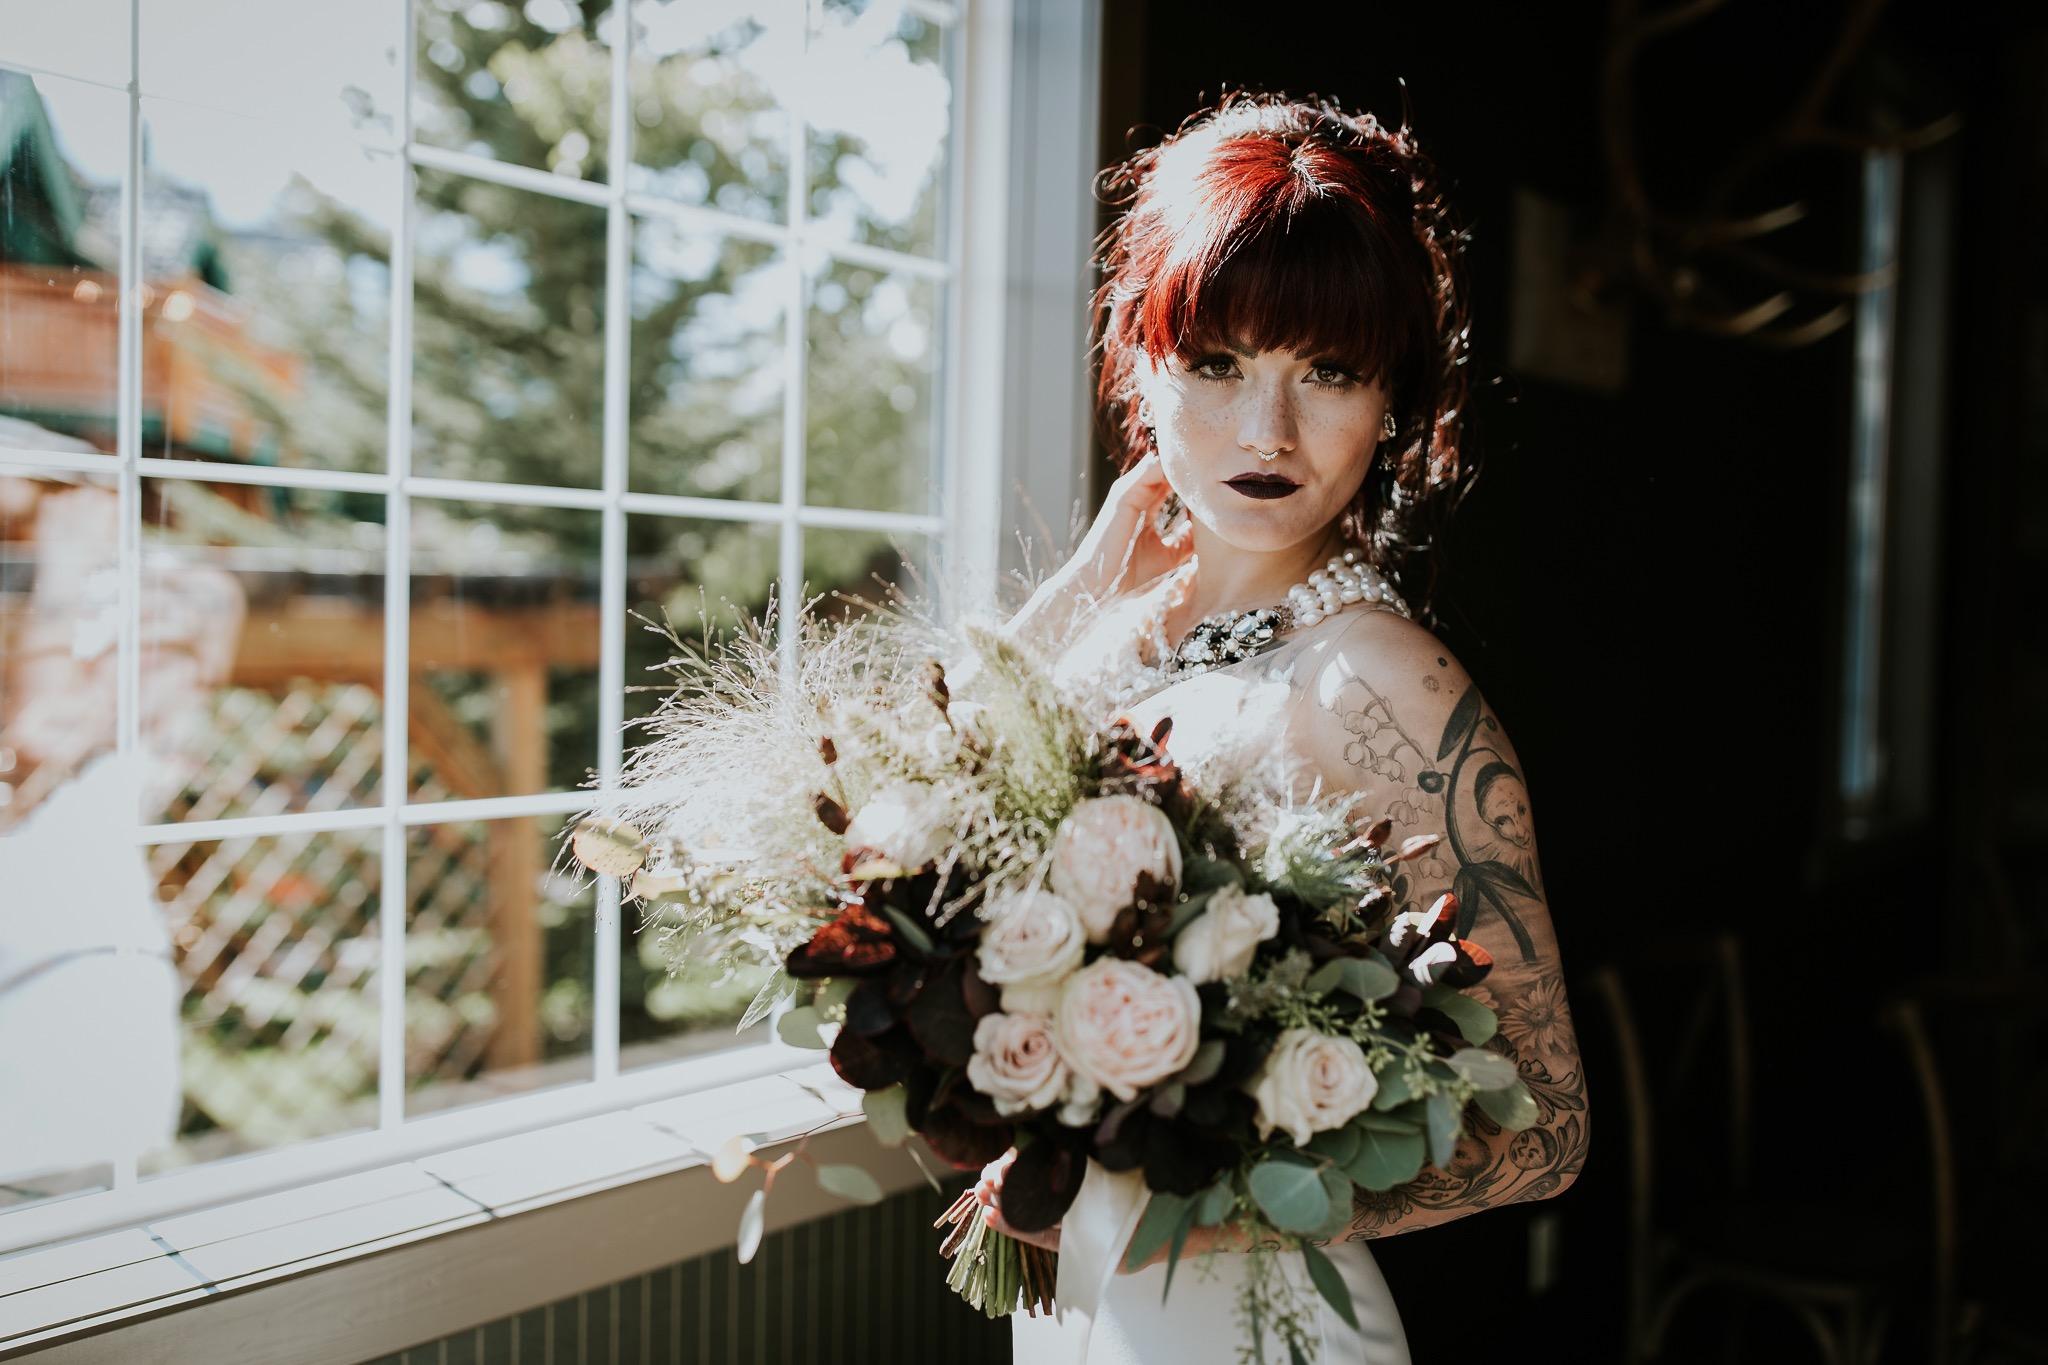 20170915-canmore-moody-wedding-photographer-creekside-creeksidestyledshoot-time&fate-5570